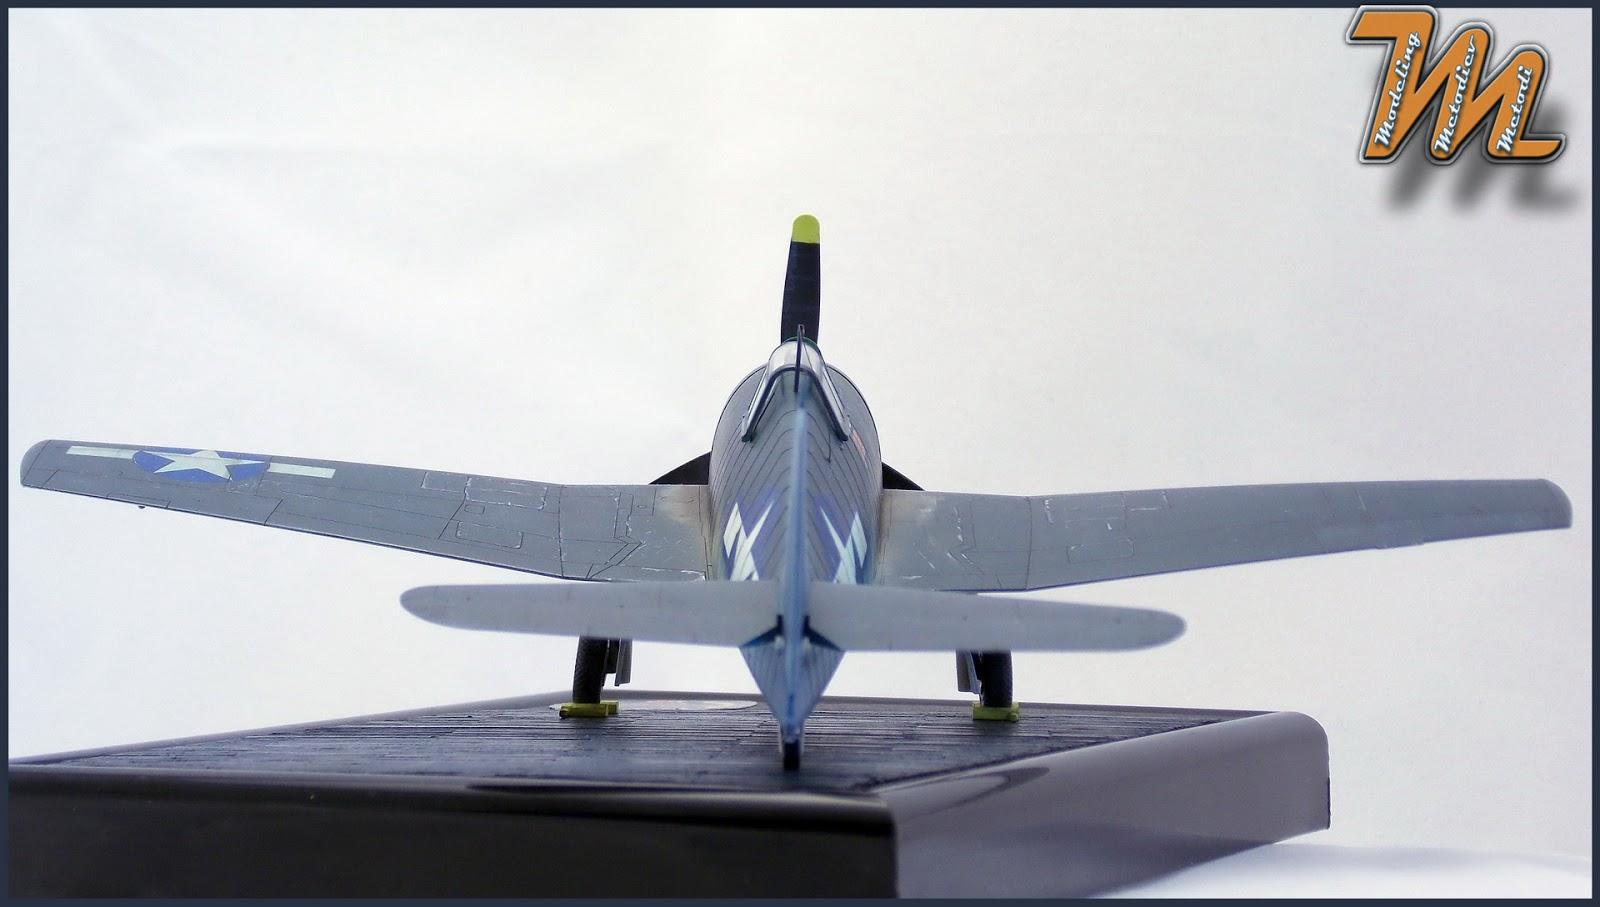 F6F, Hellcat VF-27, airplane scale model